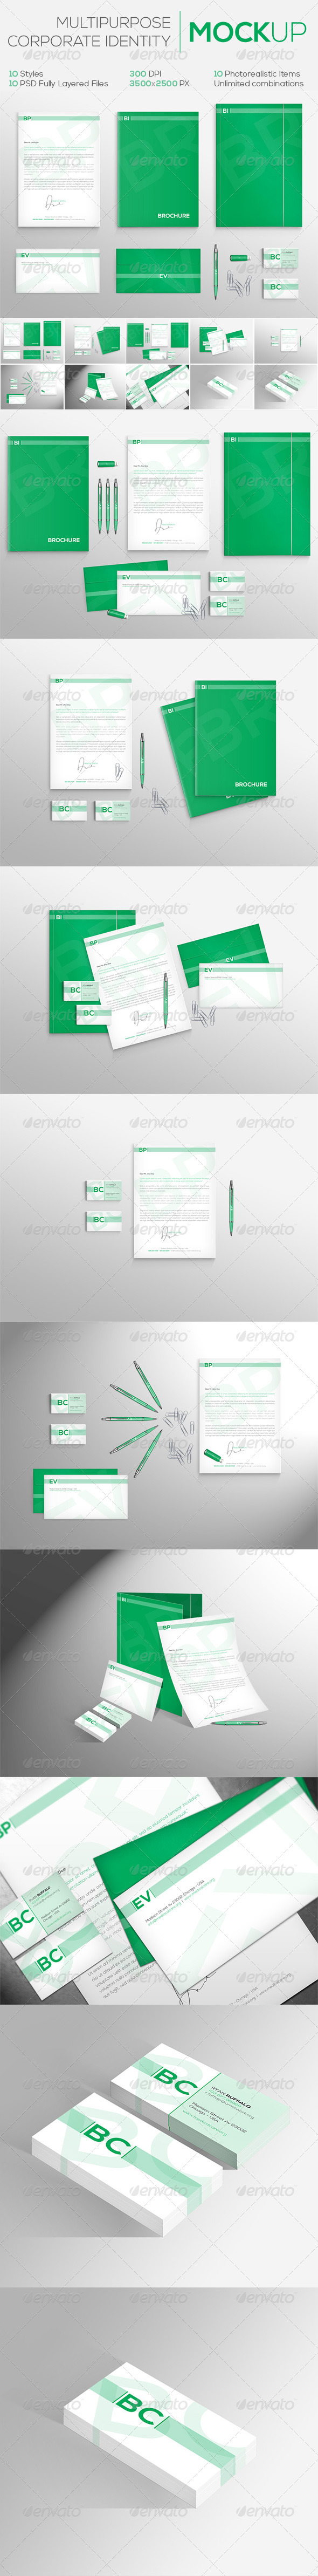 Multipurpose Corporate Identity MockUp 10 Styles